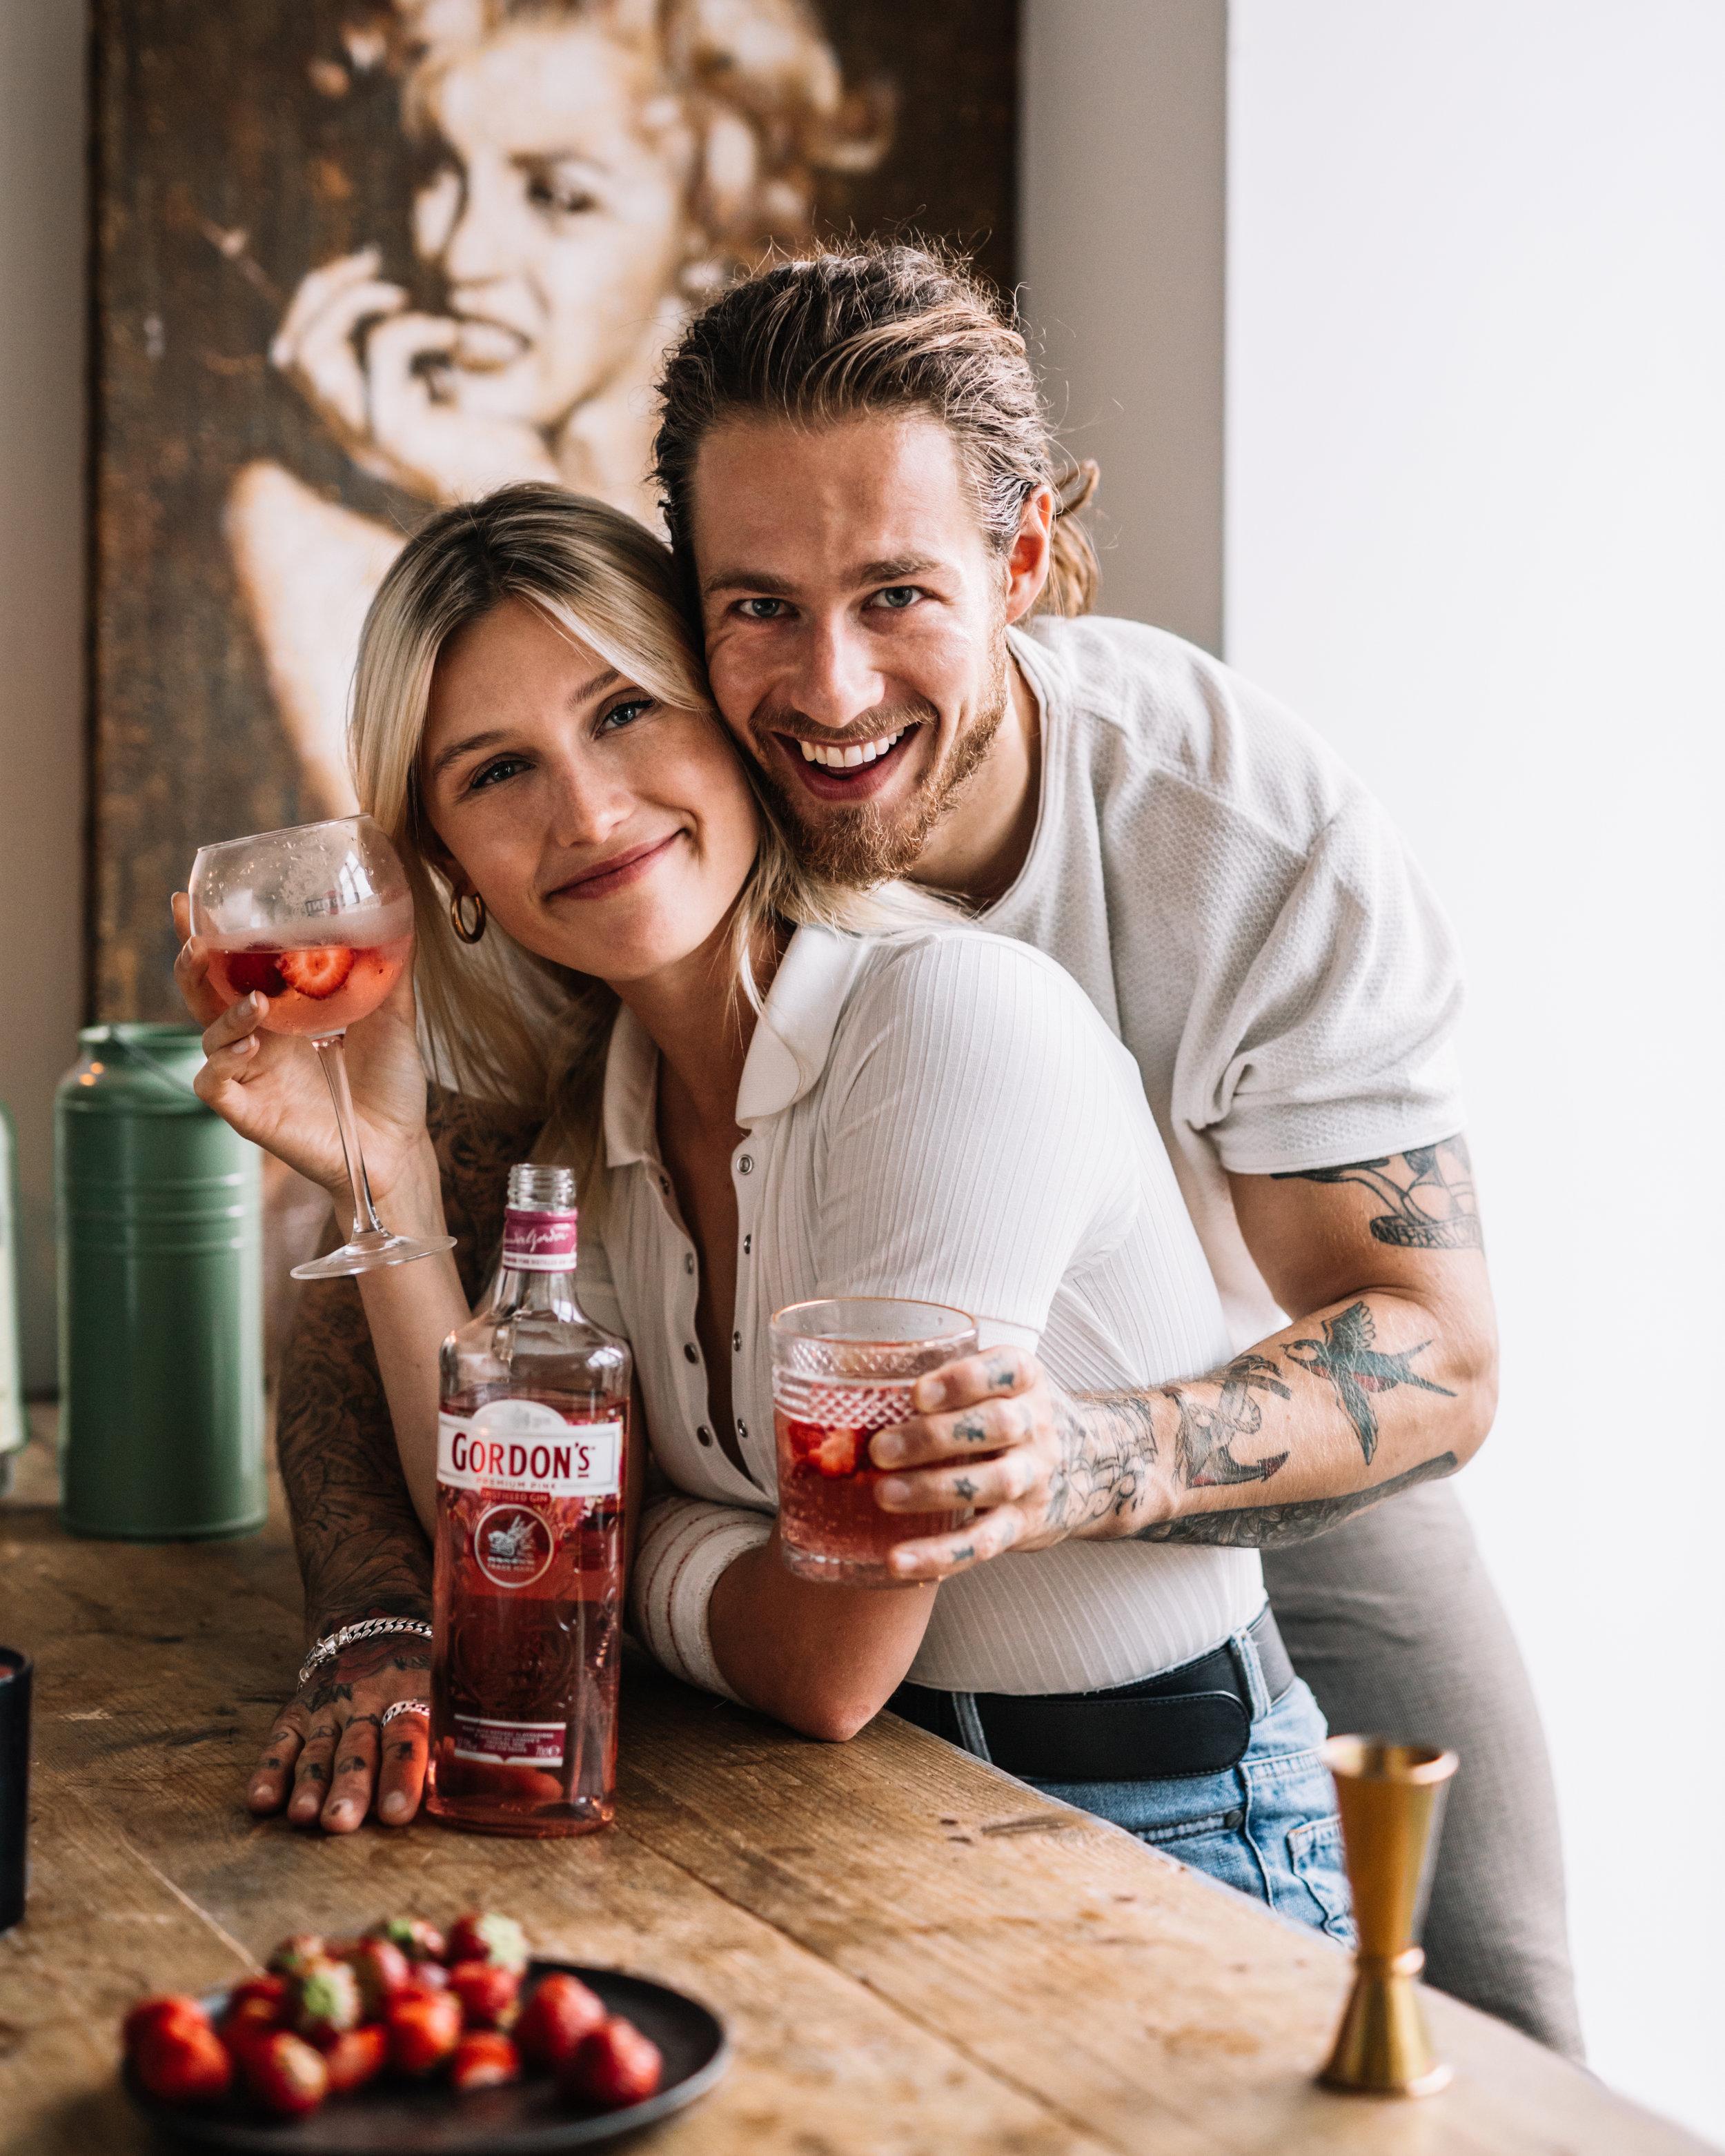 #Letscocktail Gordons Pink Gin 20188.jpg